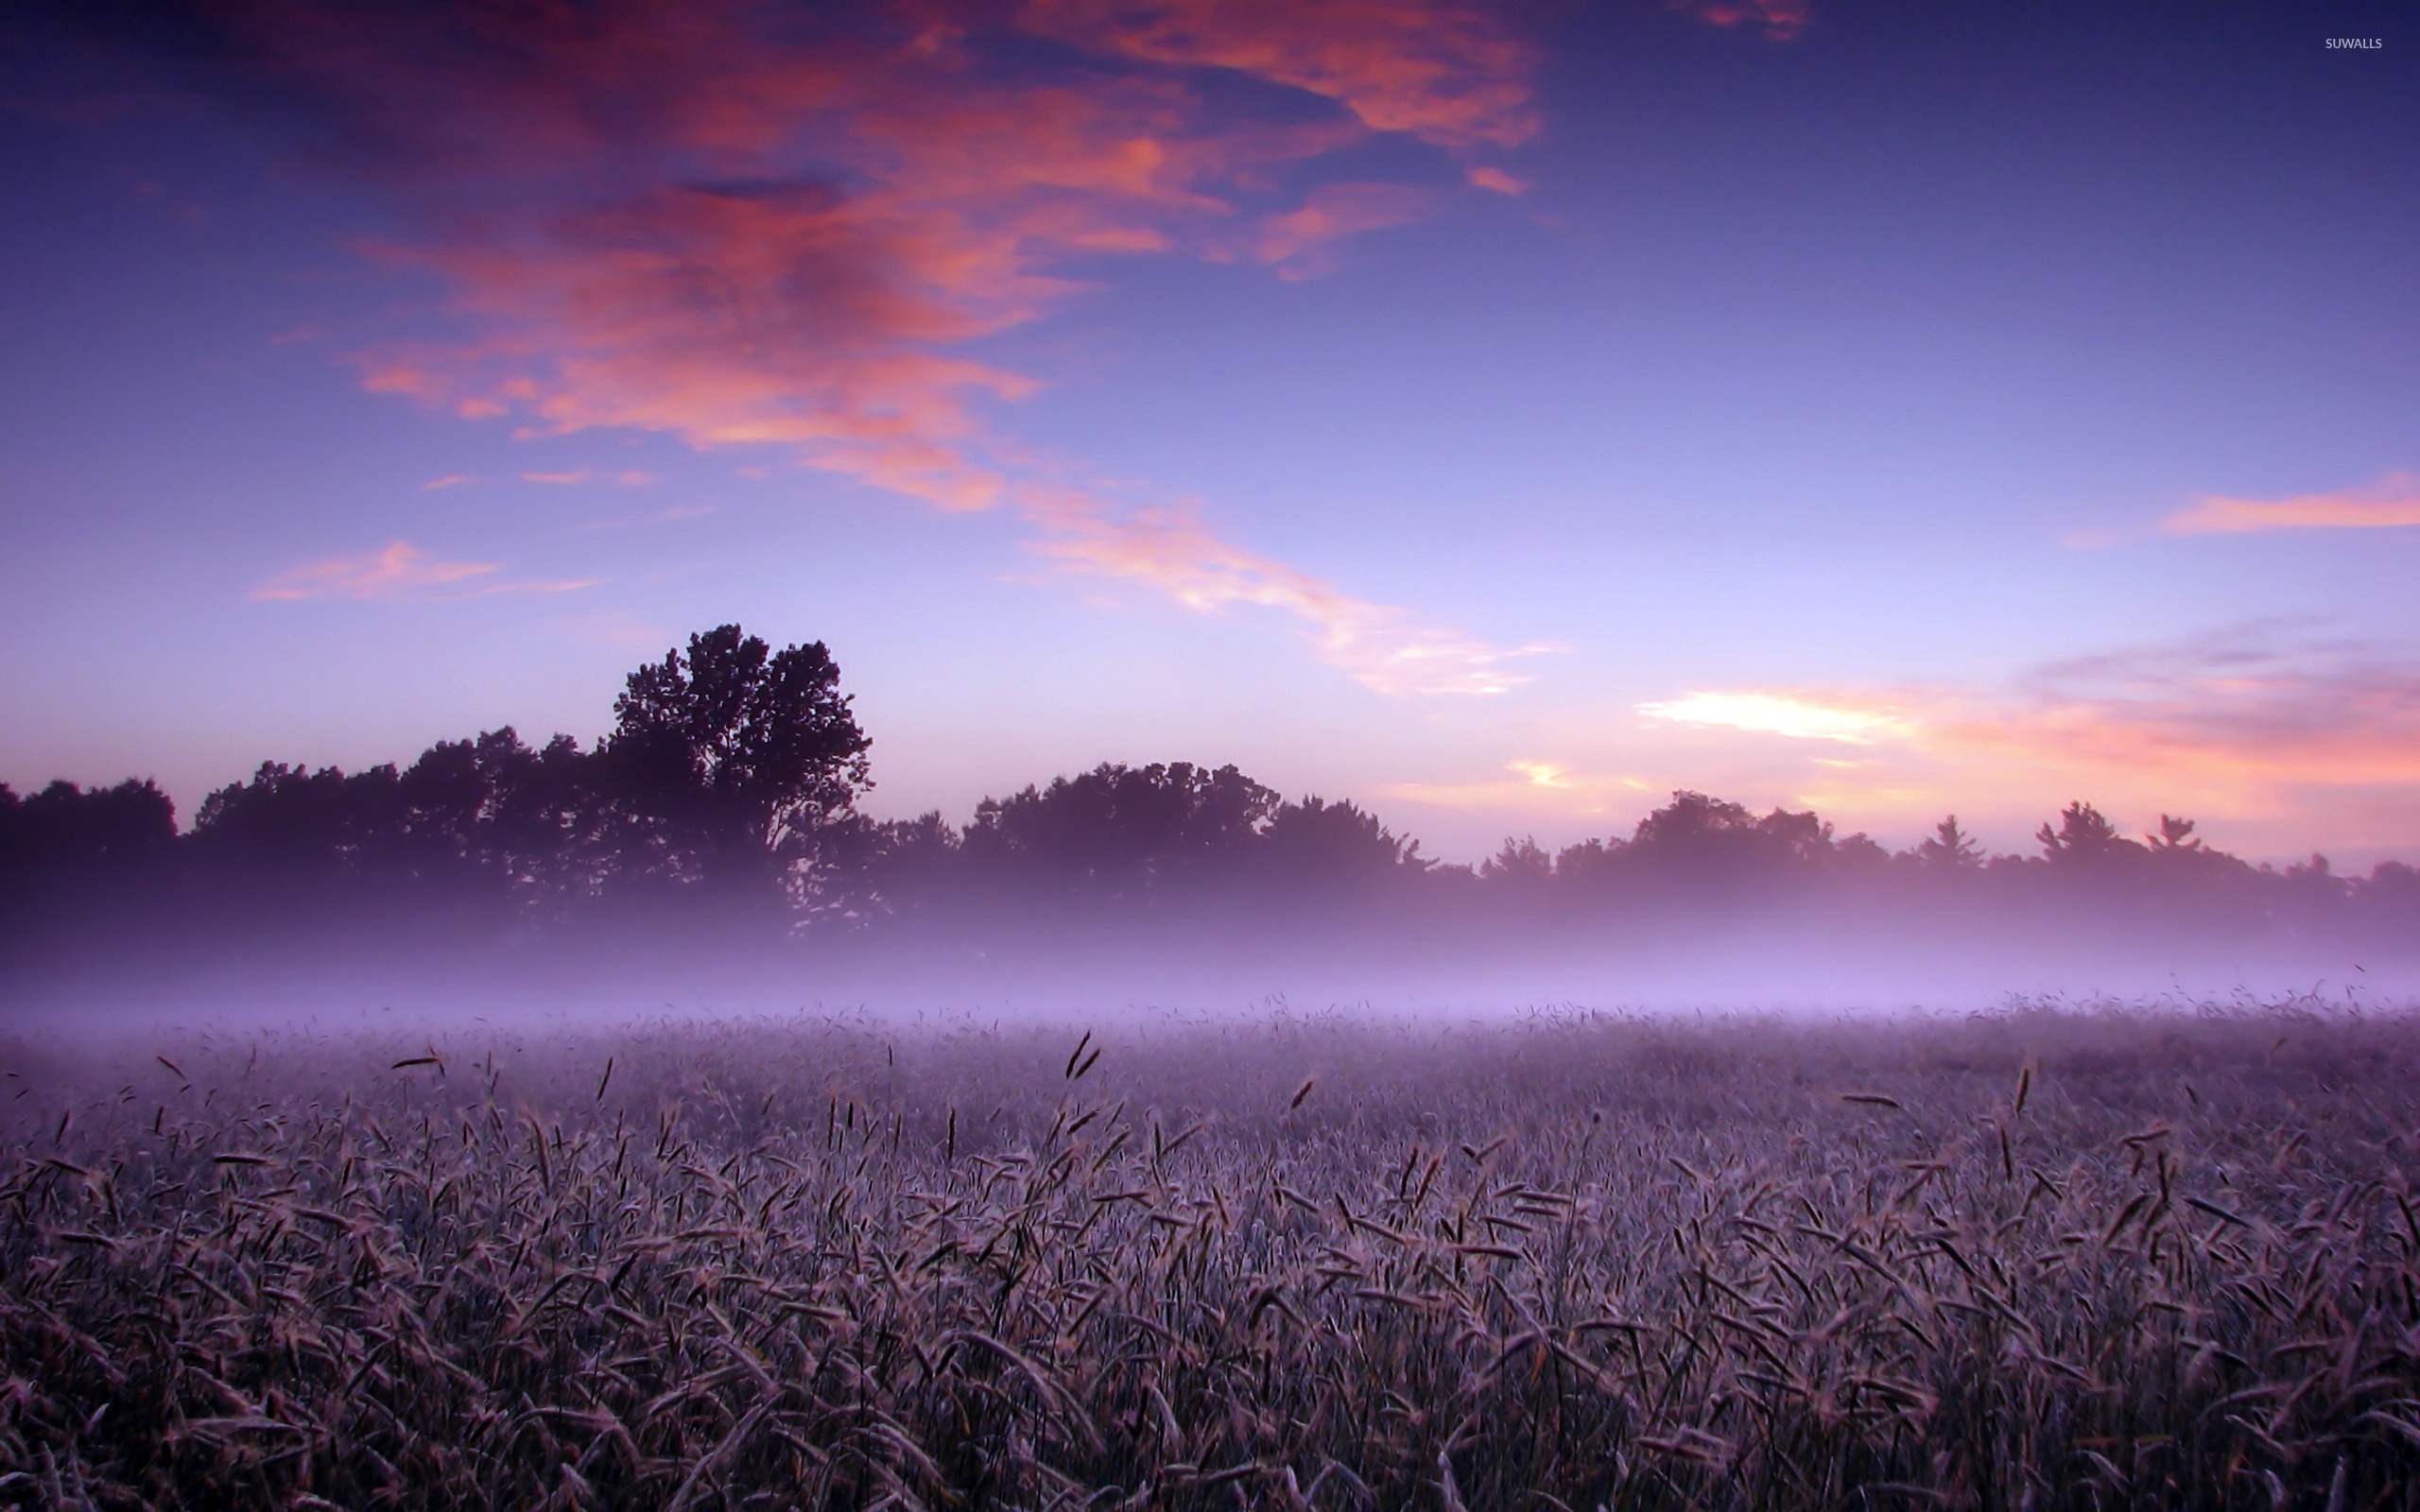 Foggy field photo